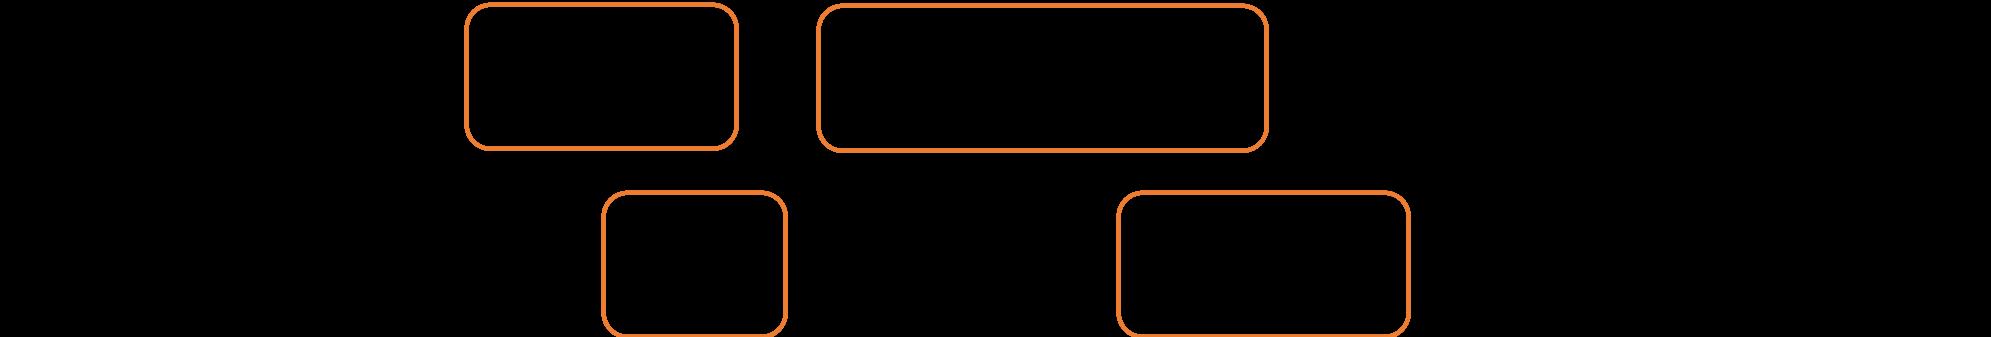 mlr-formula-other